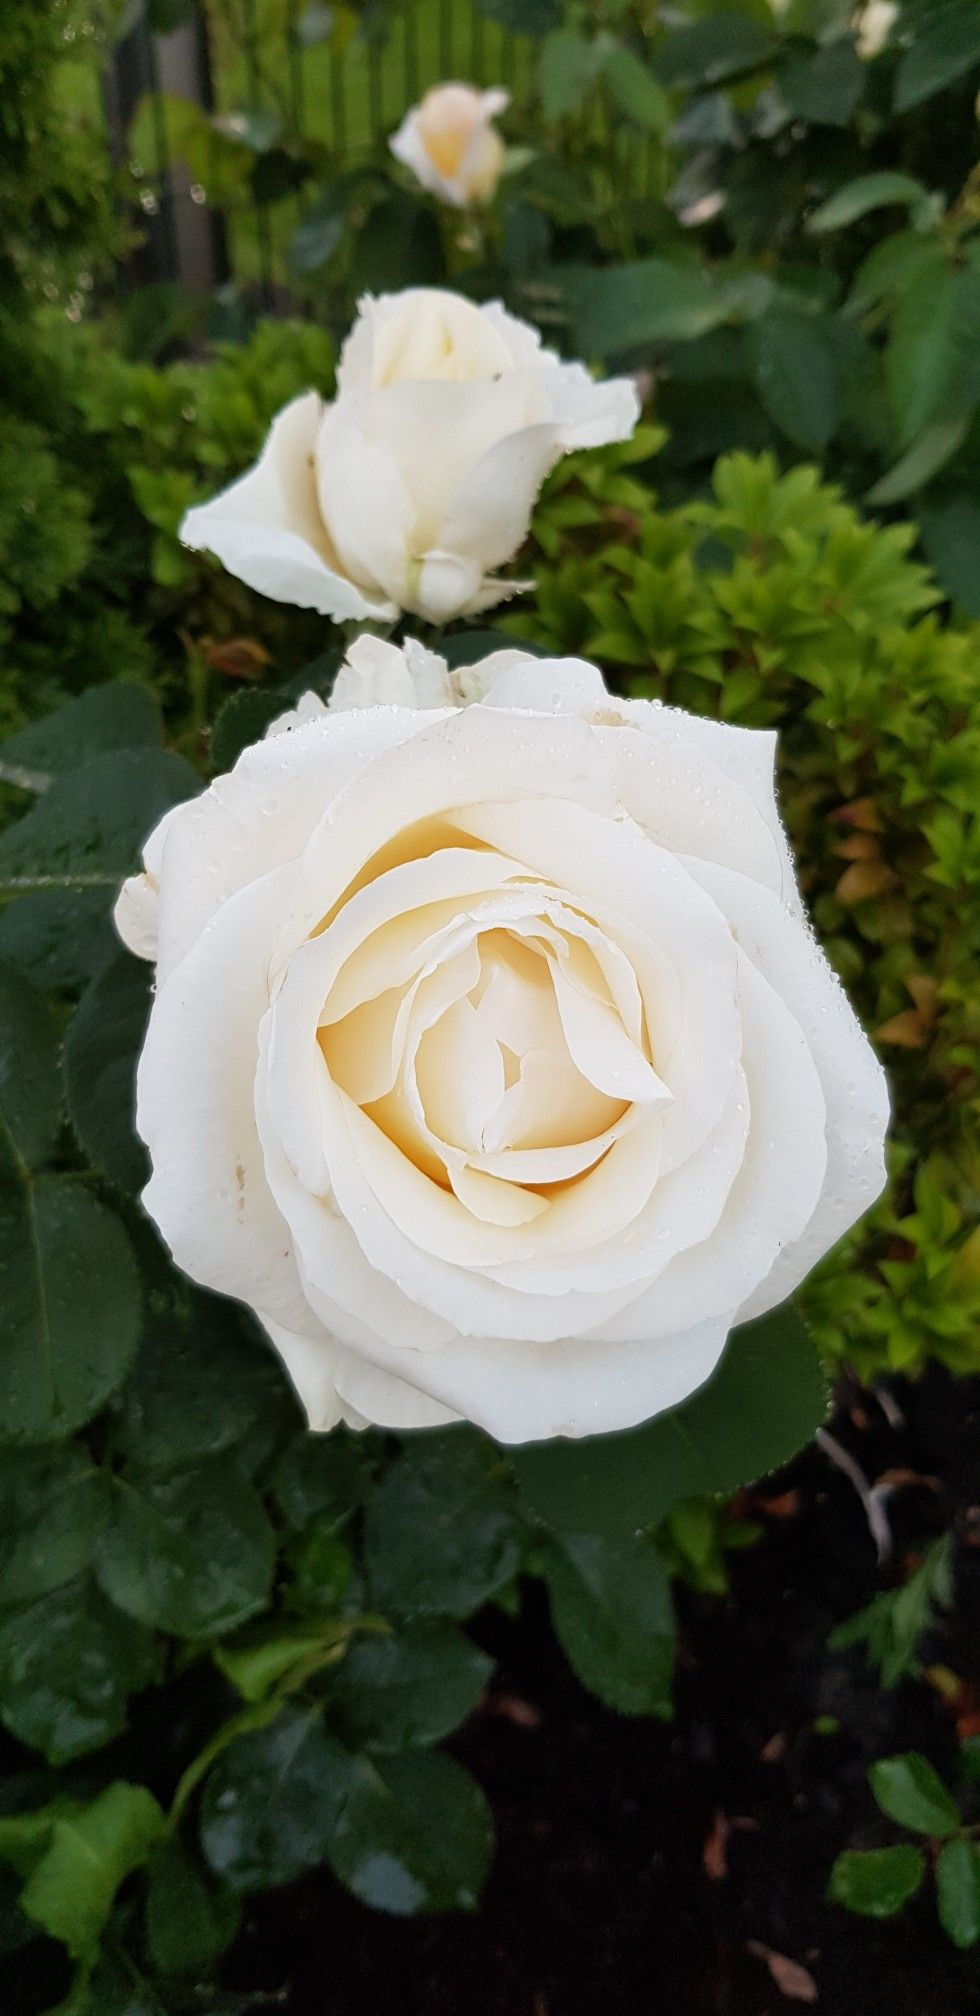 Pin By Ewa Wieckowska On Roza Polska Fryderyk Chopin Rose Plants Flowers